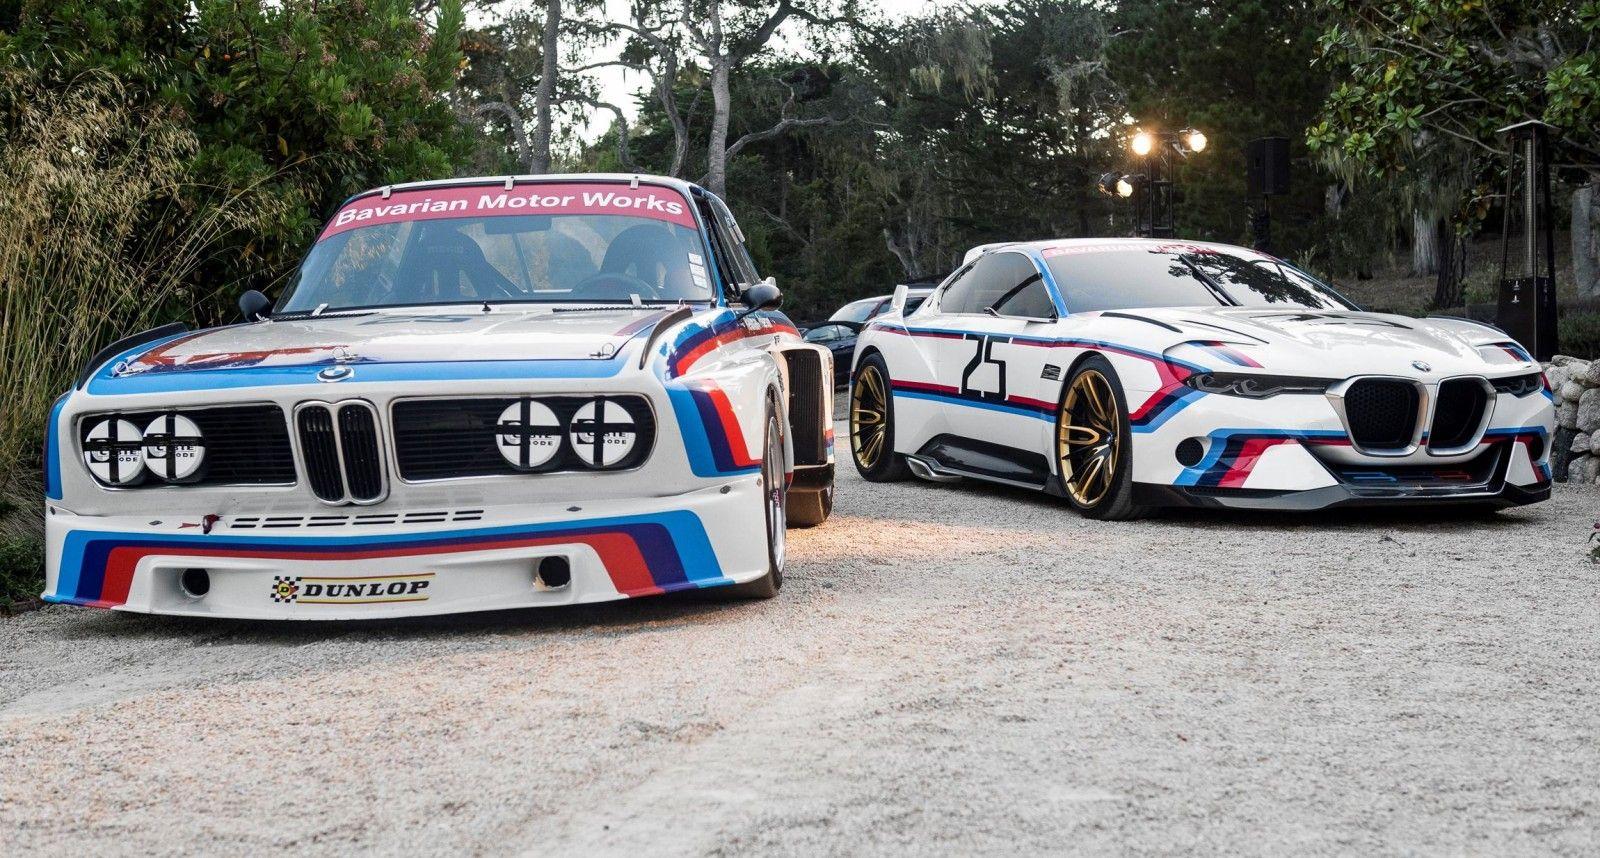 2015 Bmw 3 0 Csl Hommage R Concept Bmw 3 0 Csl Bmw Classic Cars Bmw